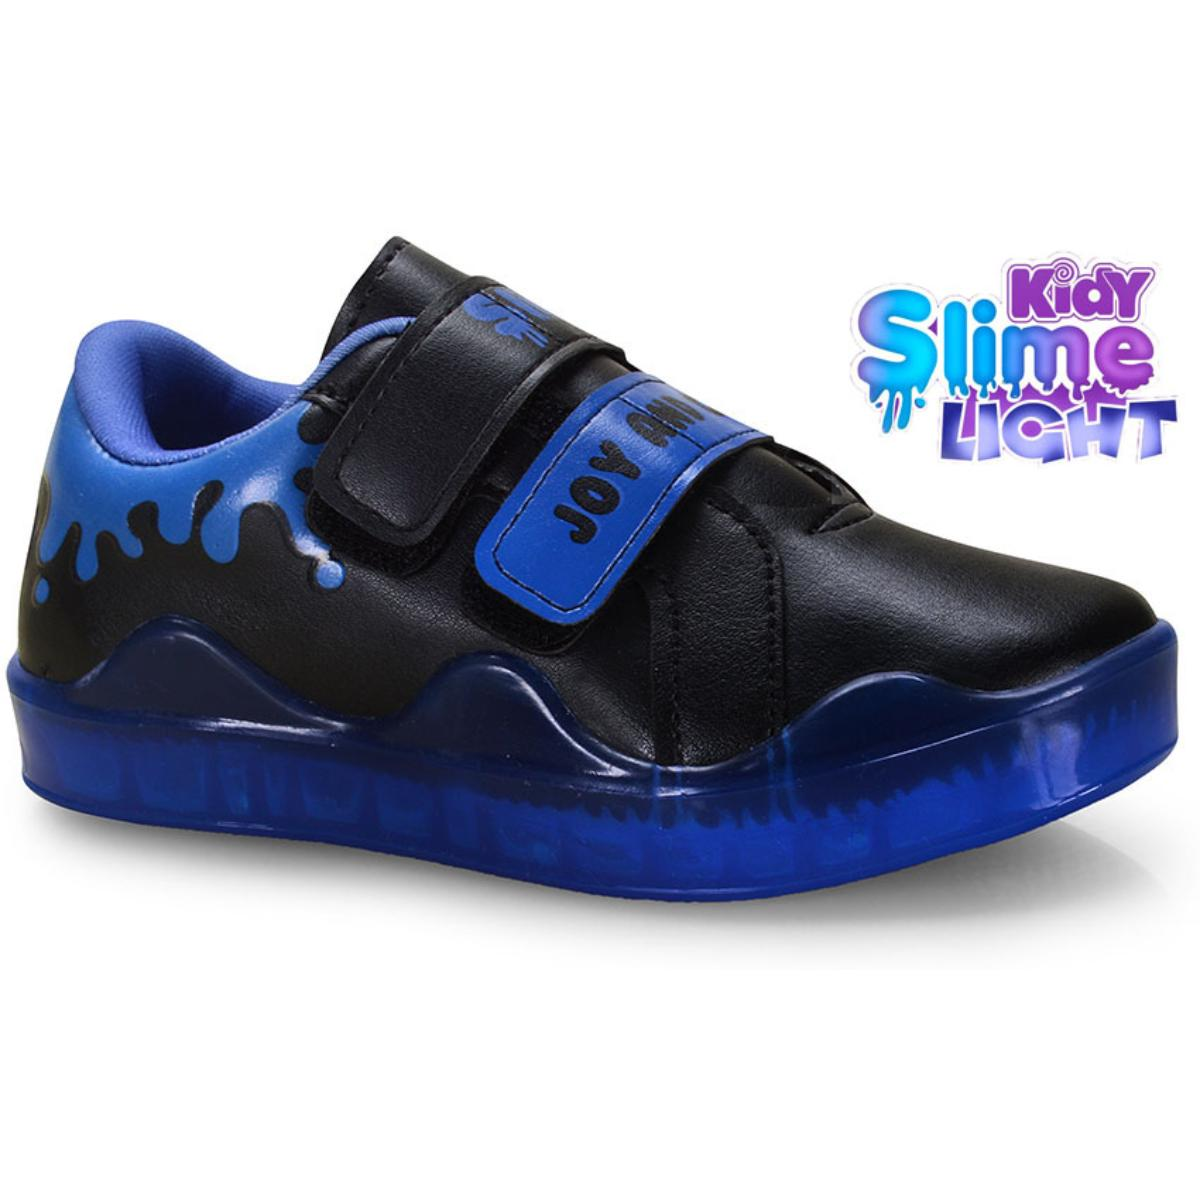 Tênis Masc Infantil Kidy 06500020588 Preto/azul